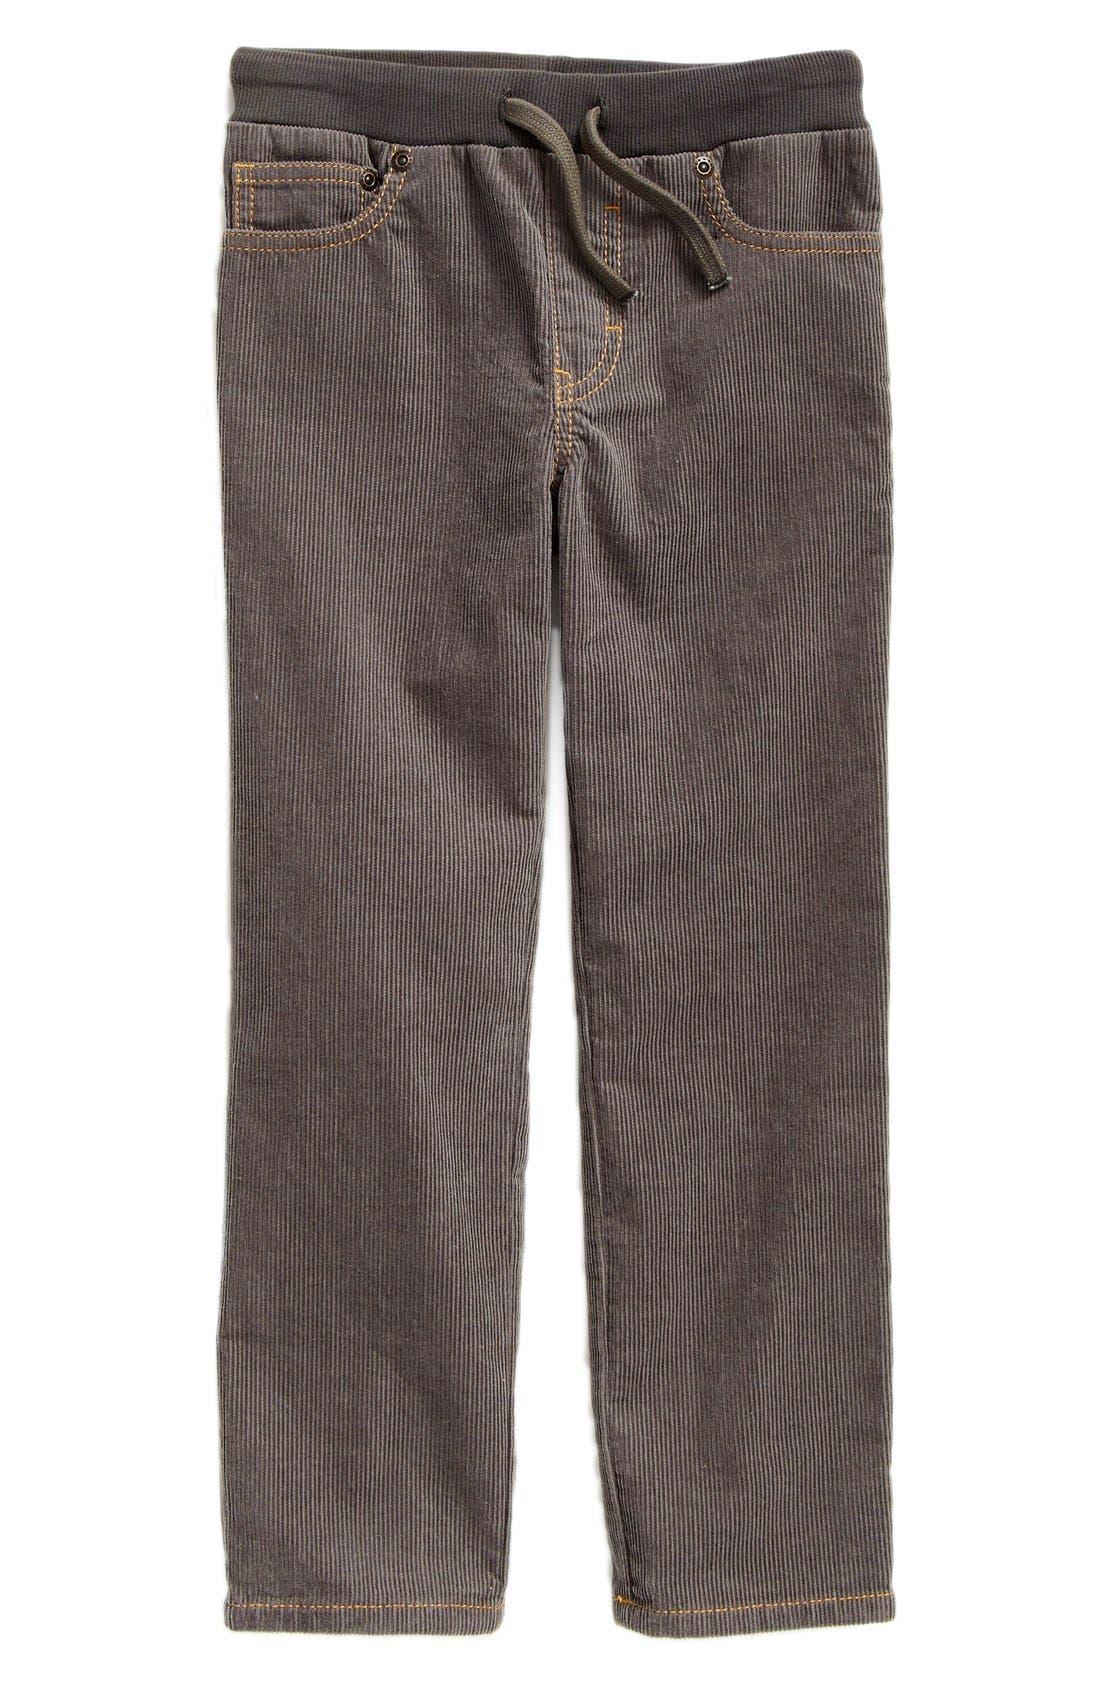 Alternate Image 1 Selected - Tucker + Tate Corduroy Pants (Toddler Boys & Little Boys)